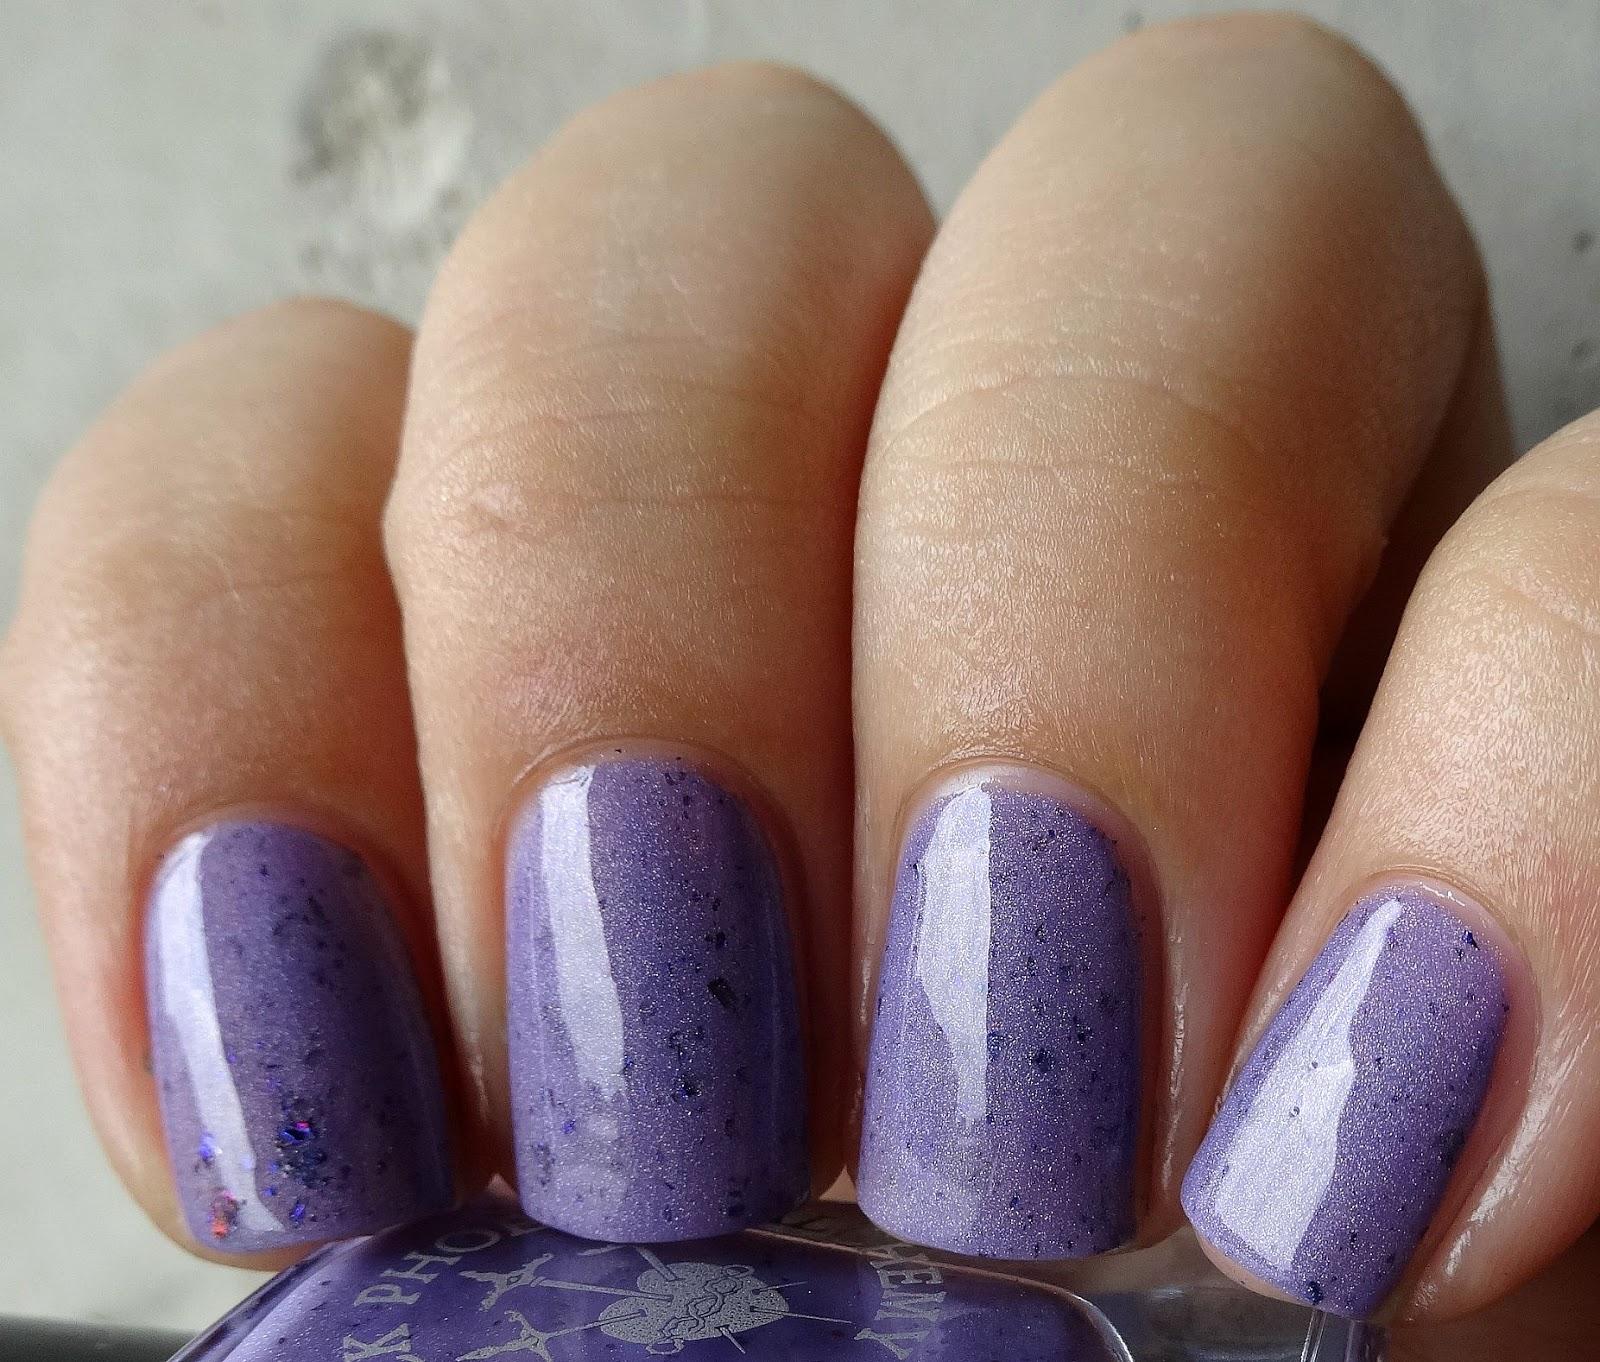 Ida Nails It: Black Phoenix Alchemy Lab Claw Polish: Swatches and Review